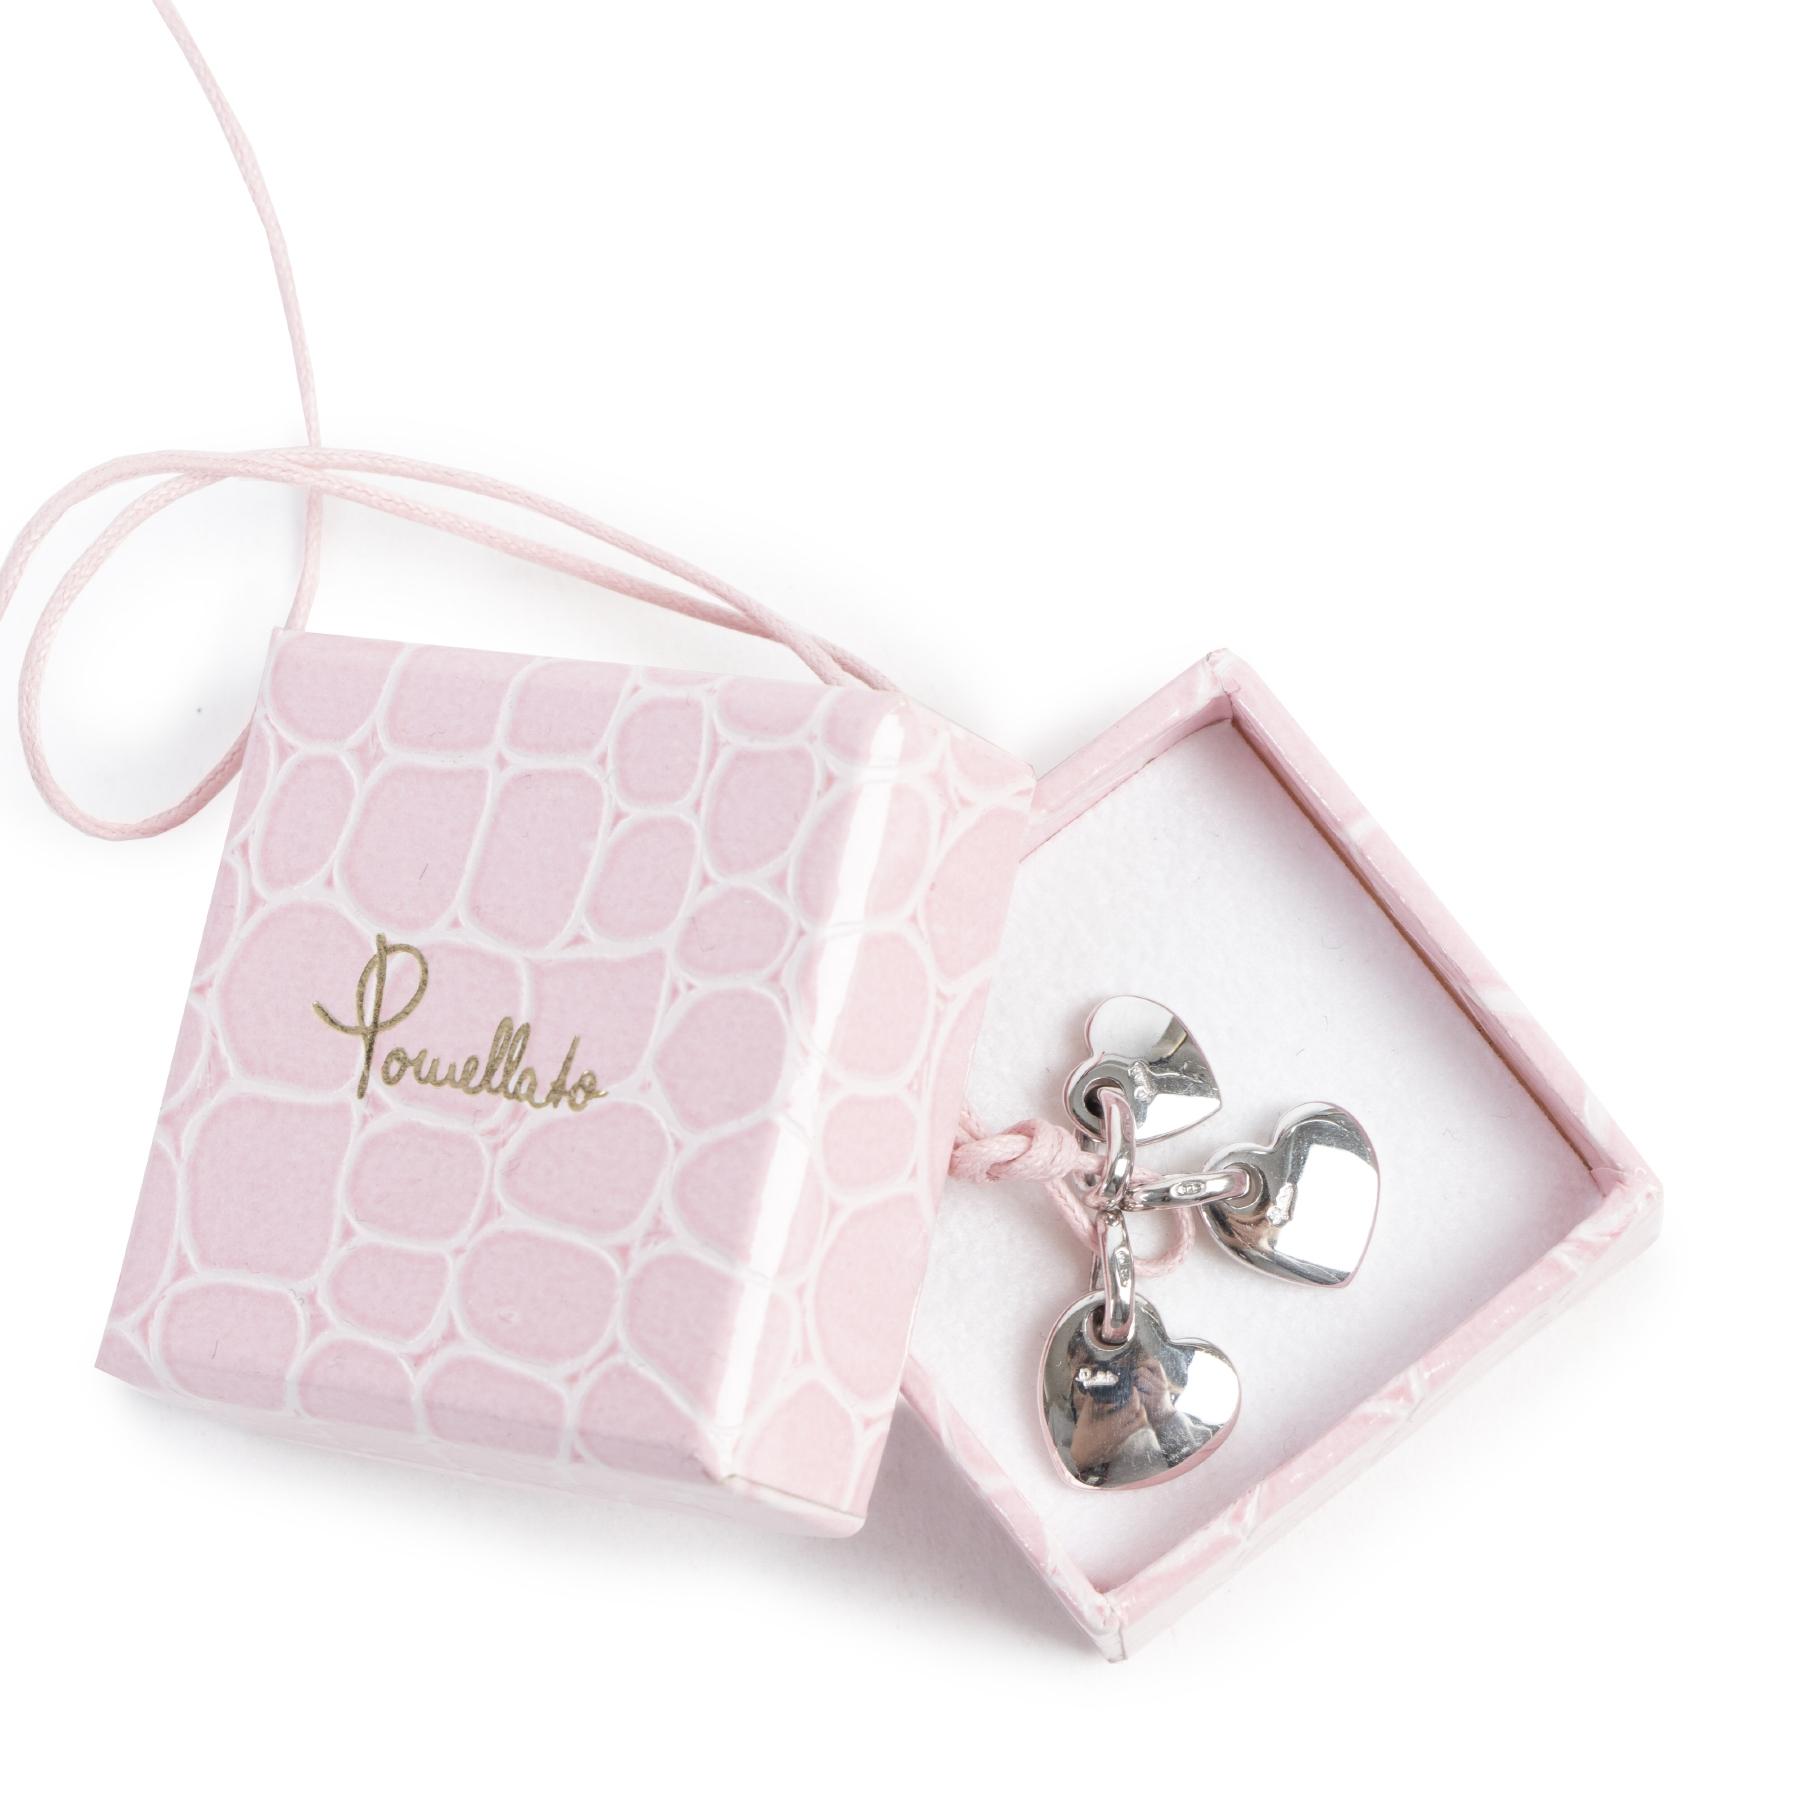 acheter en ligne seconde main Pomellato Silver Heart Pendant Necklace